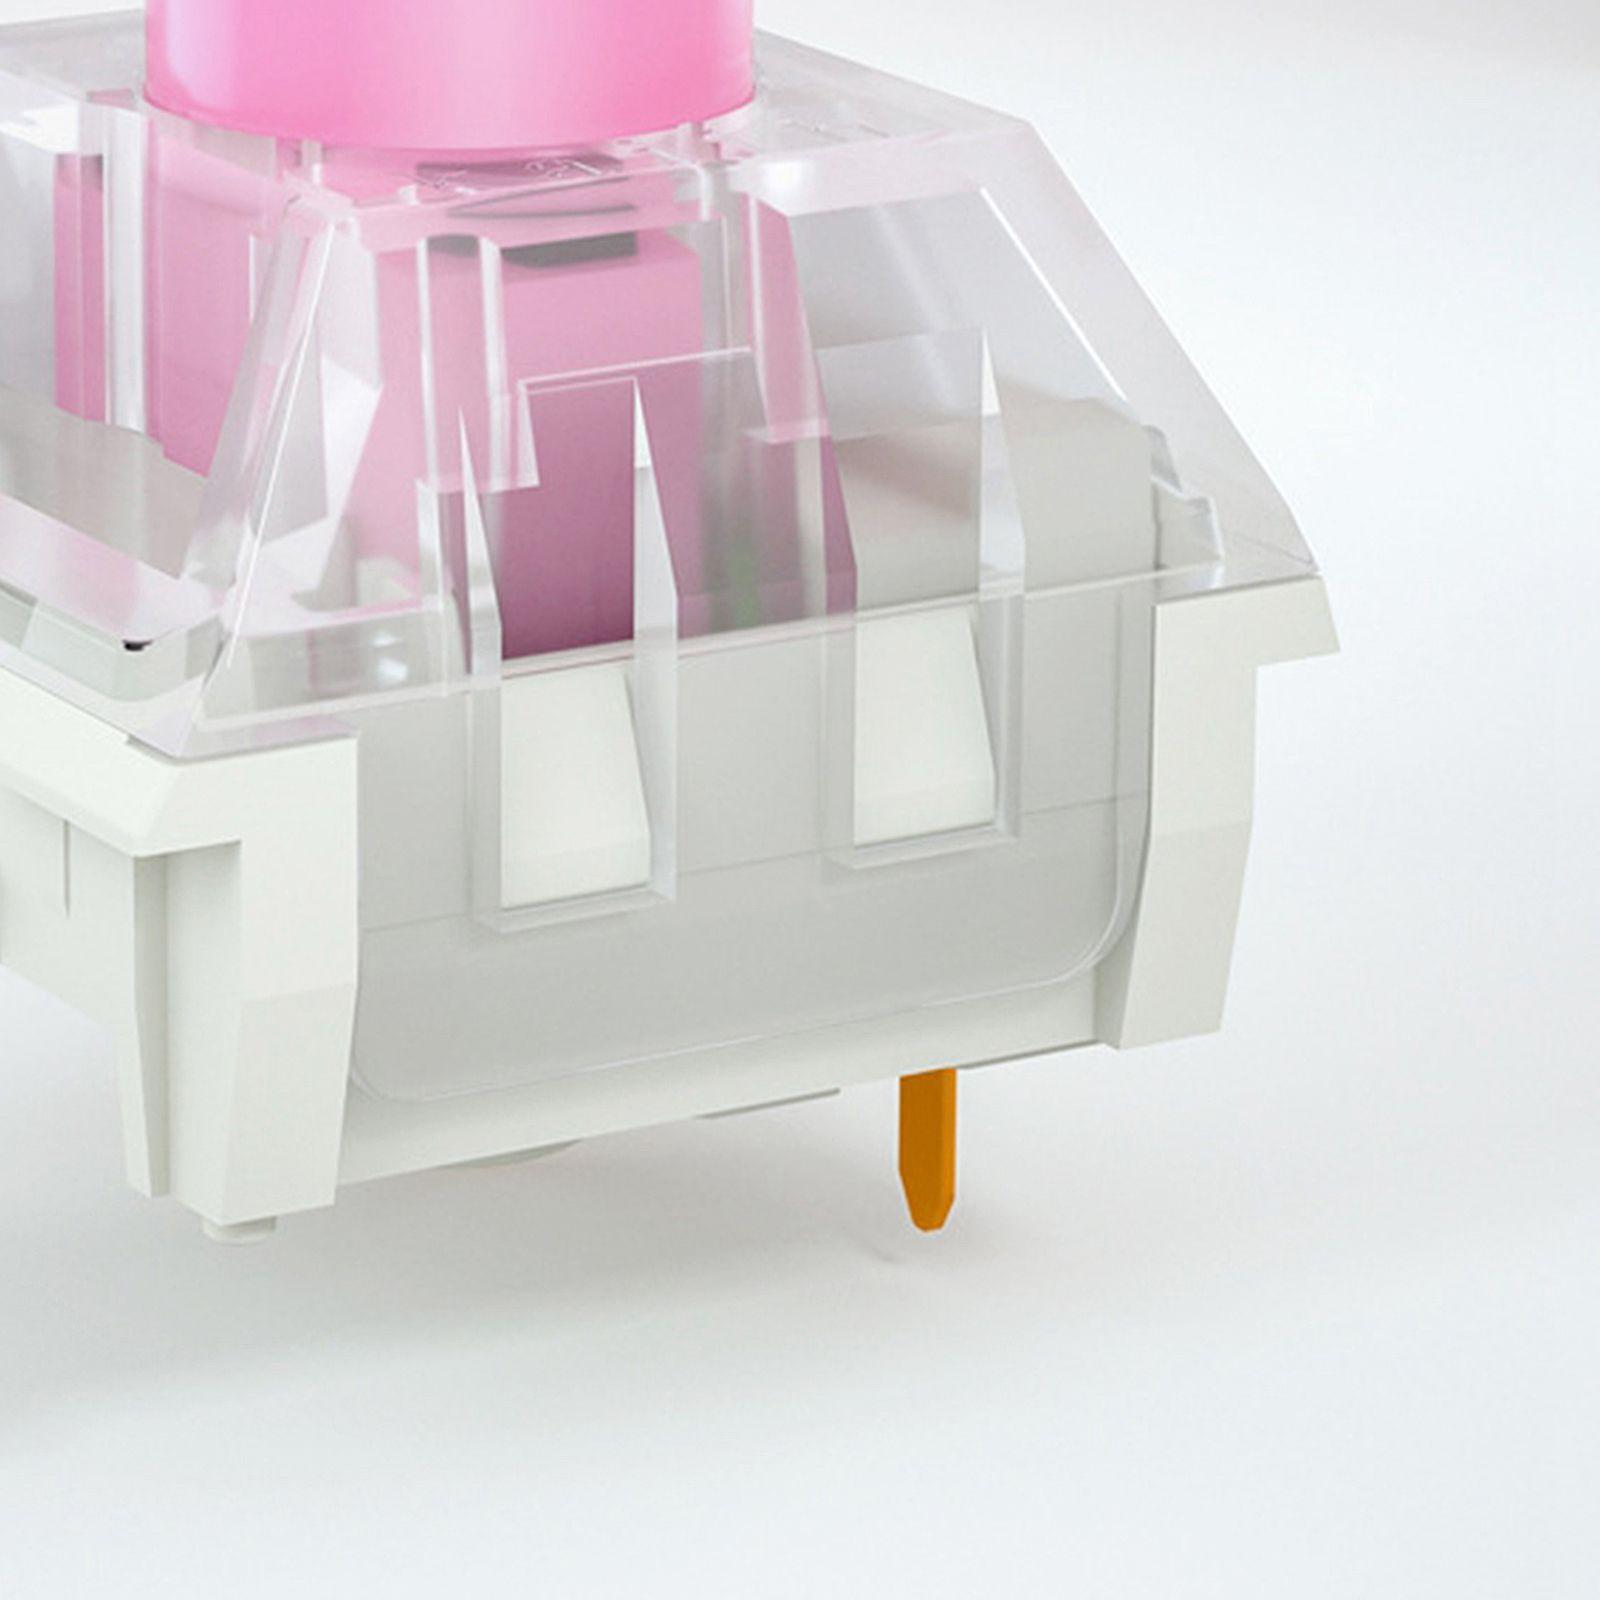 5pcs Kailh Caixa Interruptores para teclados de jogos mecânicos de Swappable, Placa Montada 3 Pins